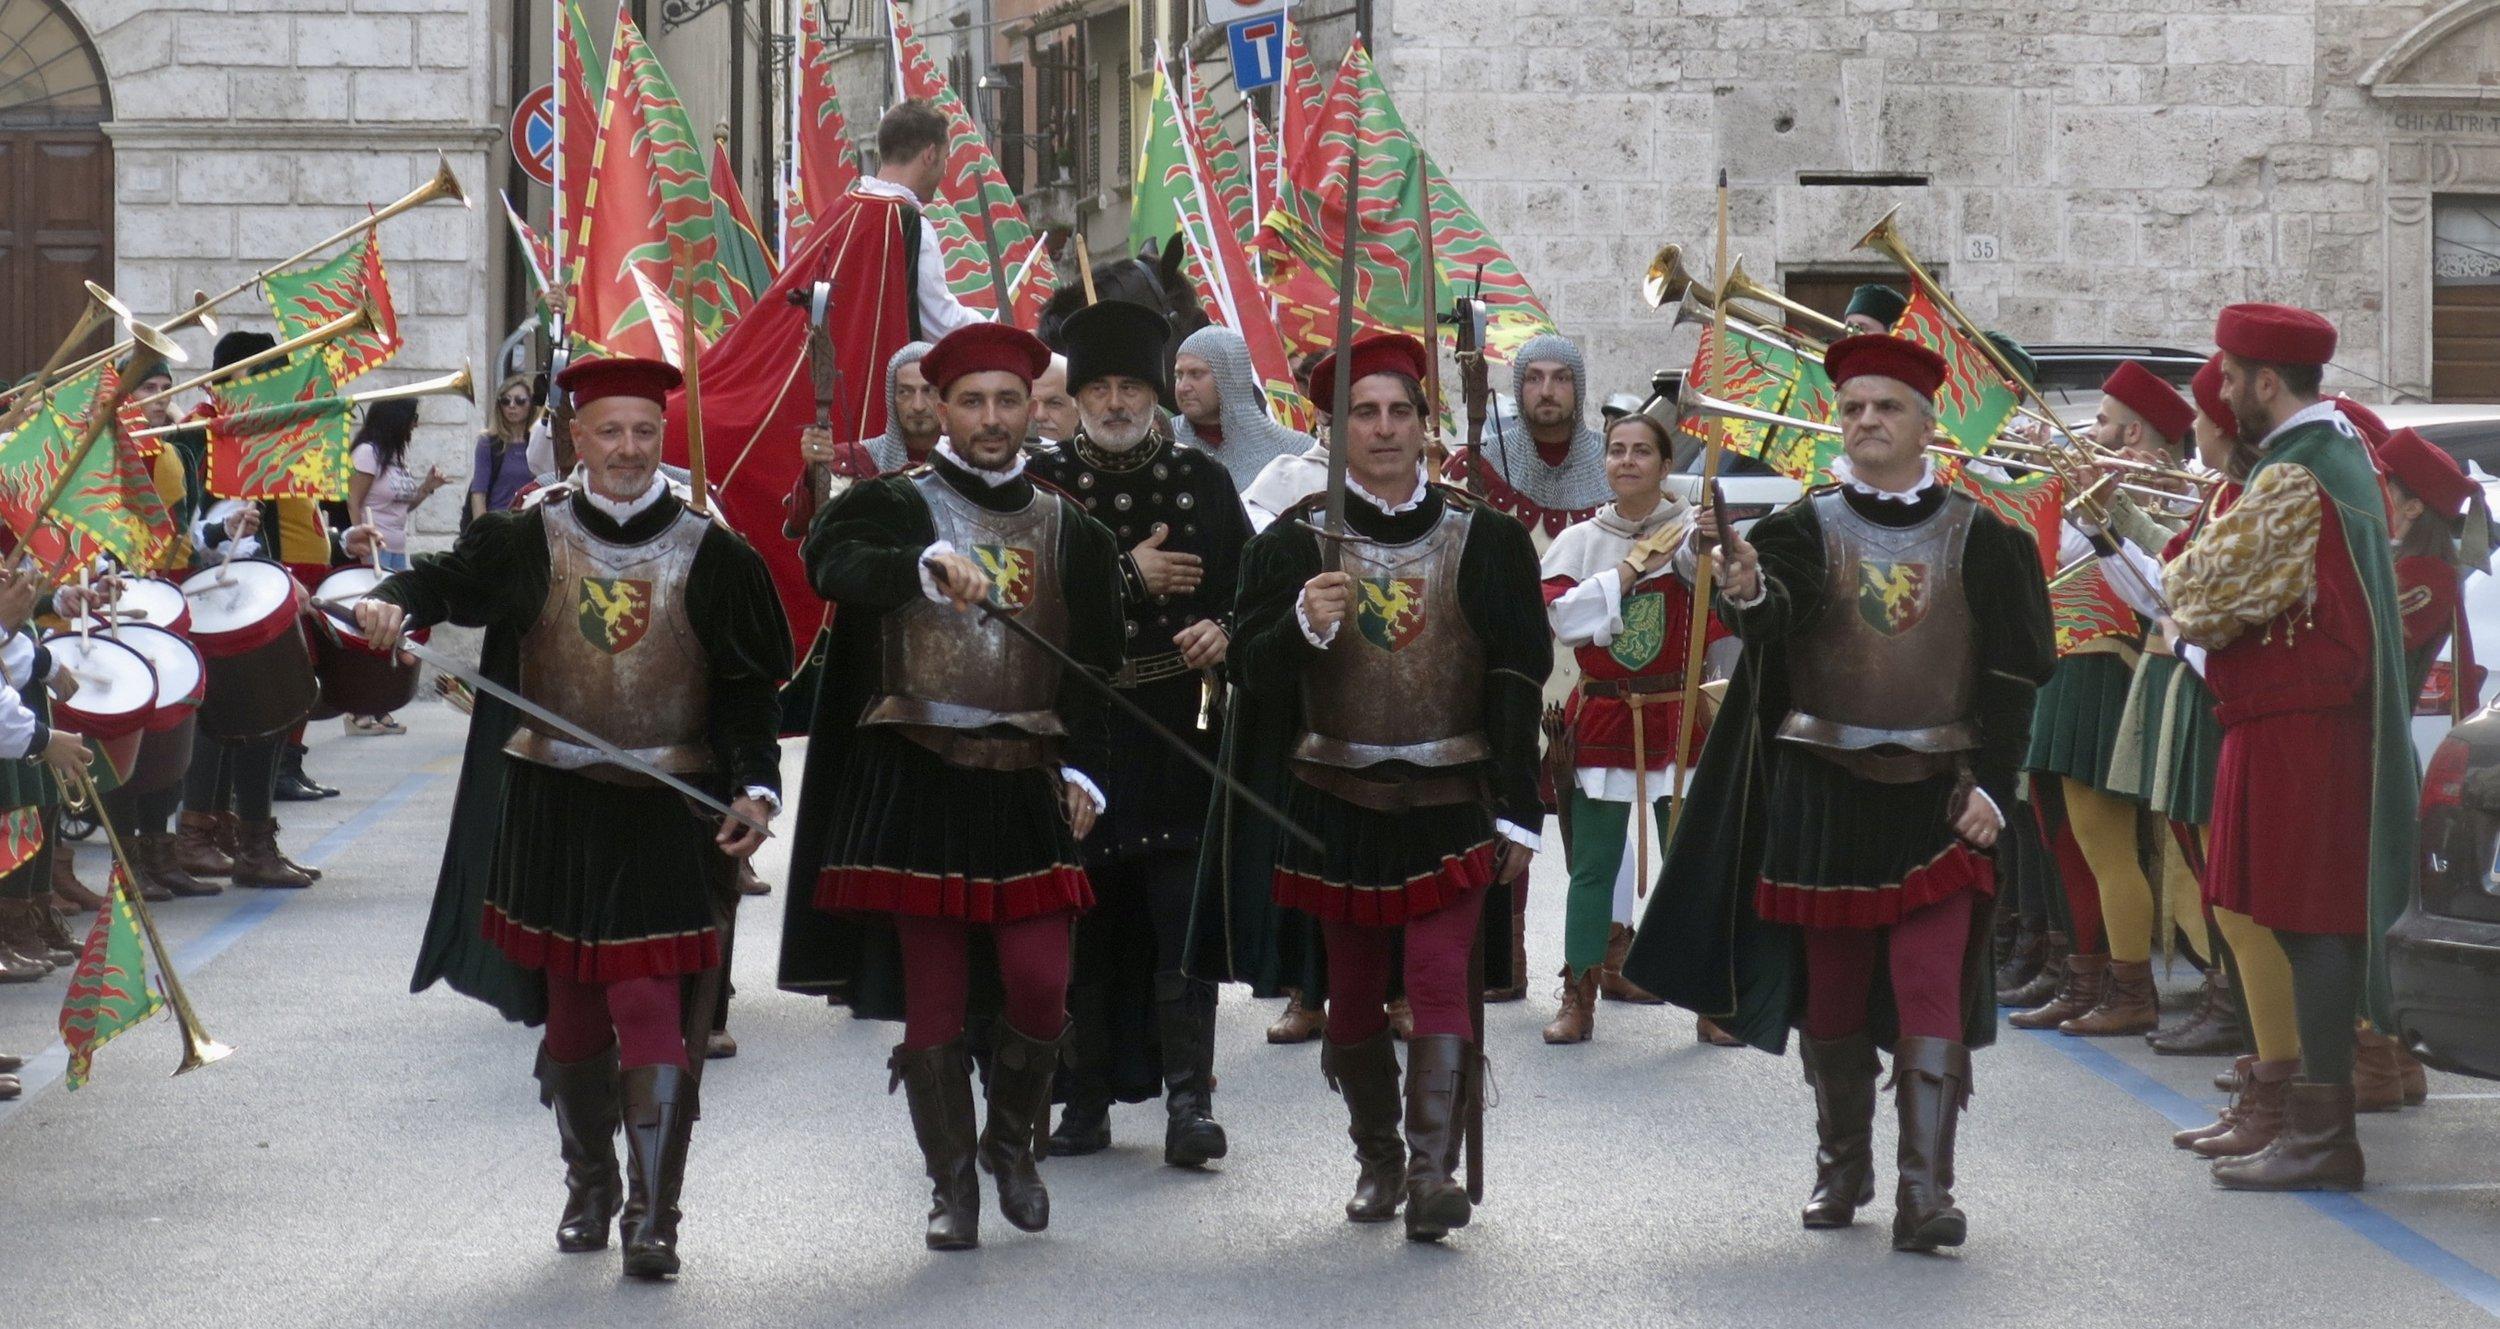 parade in Le Marche, Italy